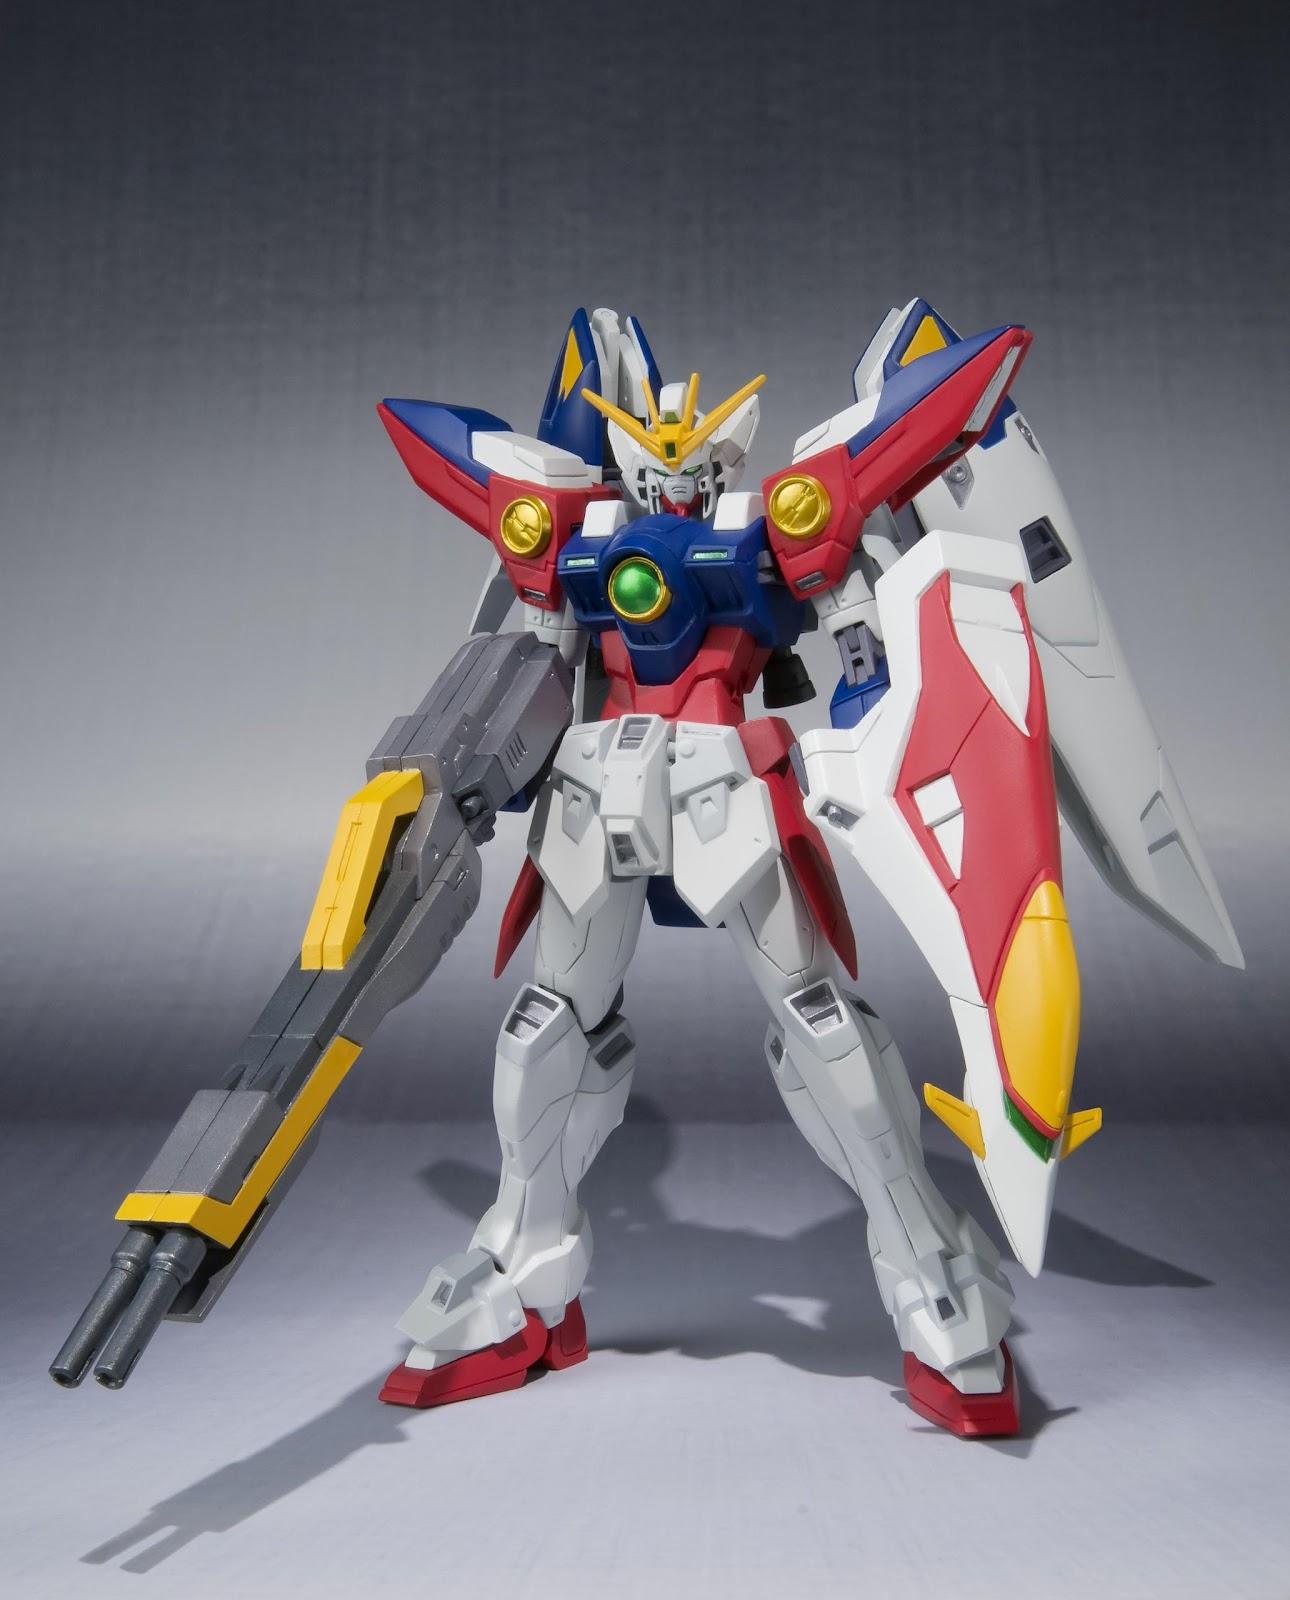 USED Robot Spirits SIDE MS Wing Gundam Zero Bandai